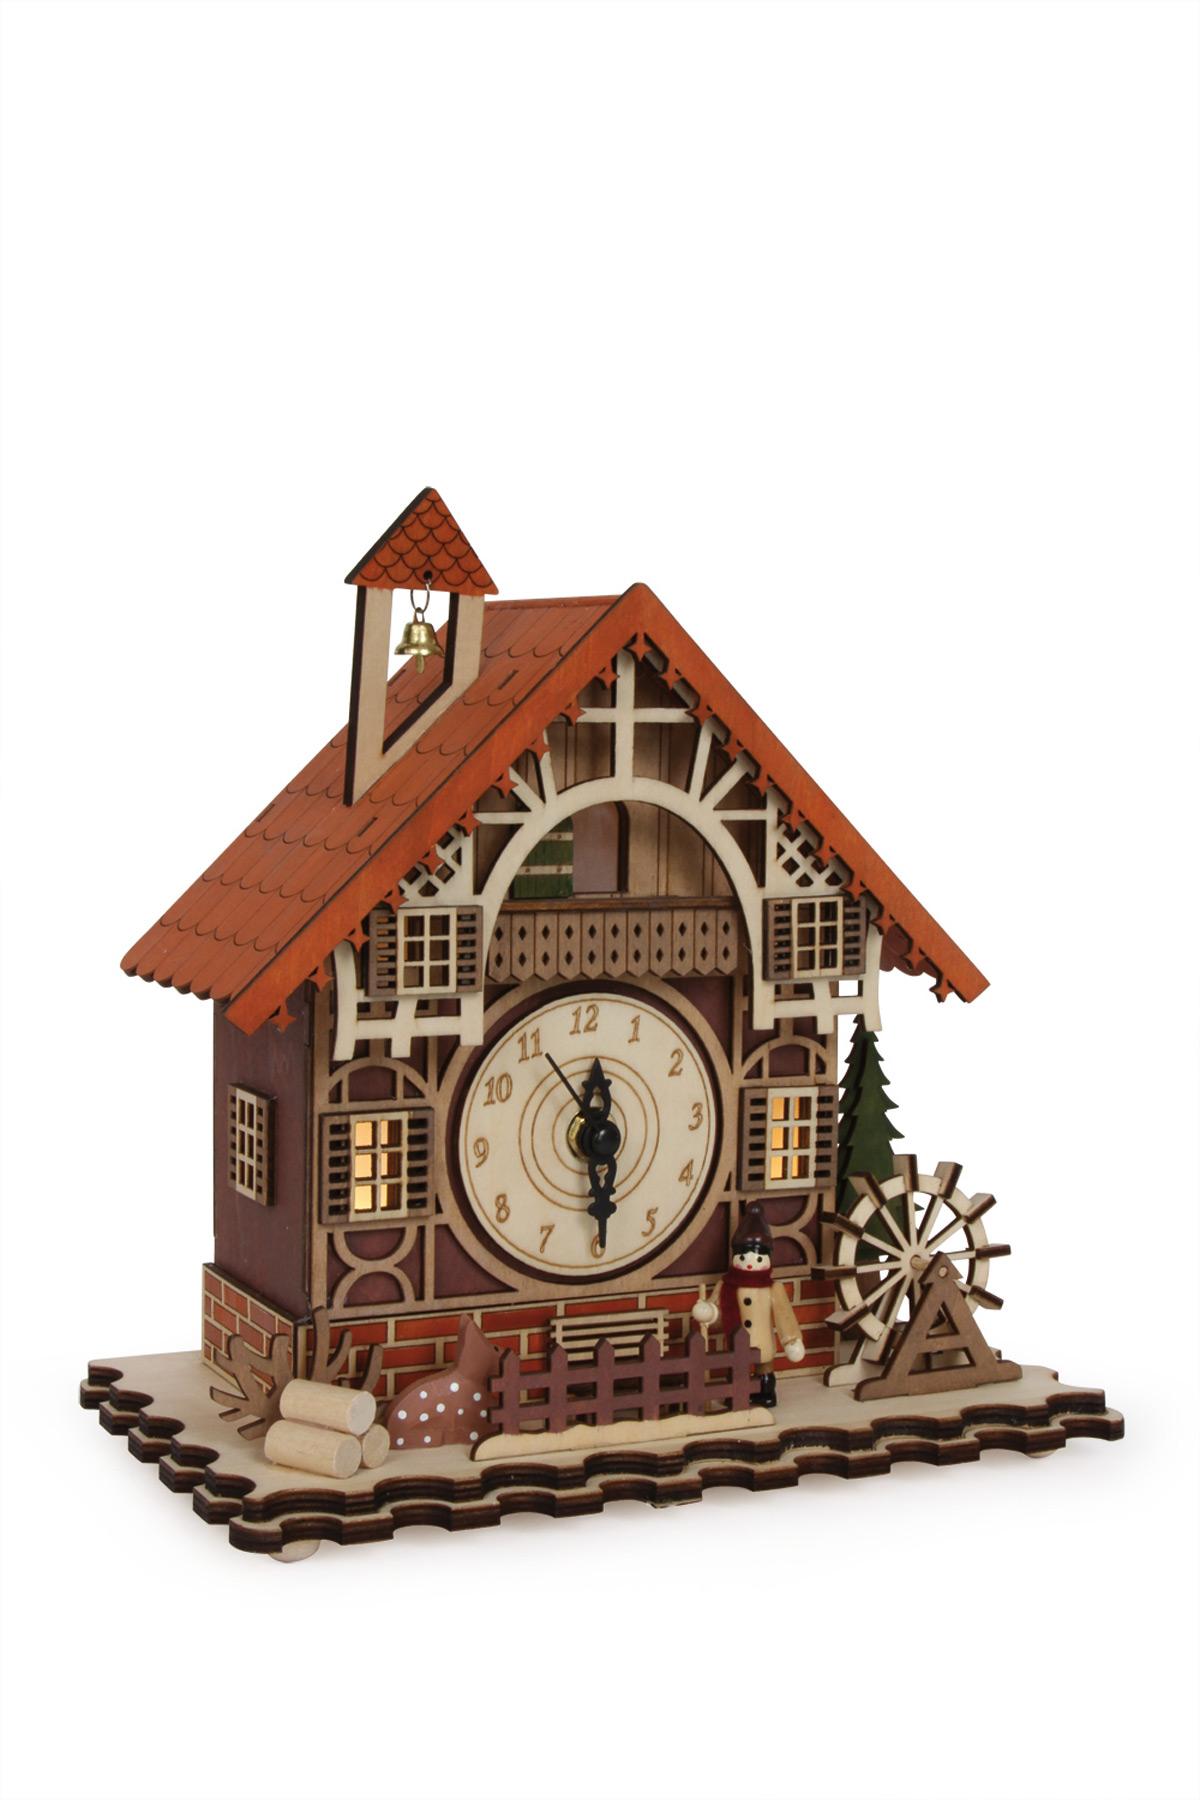 Horloge maison colombages for Horloge maison